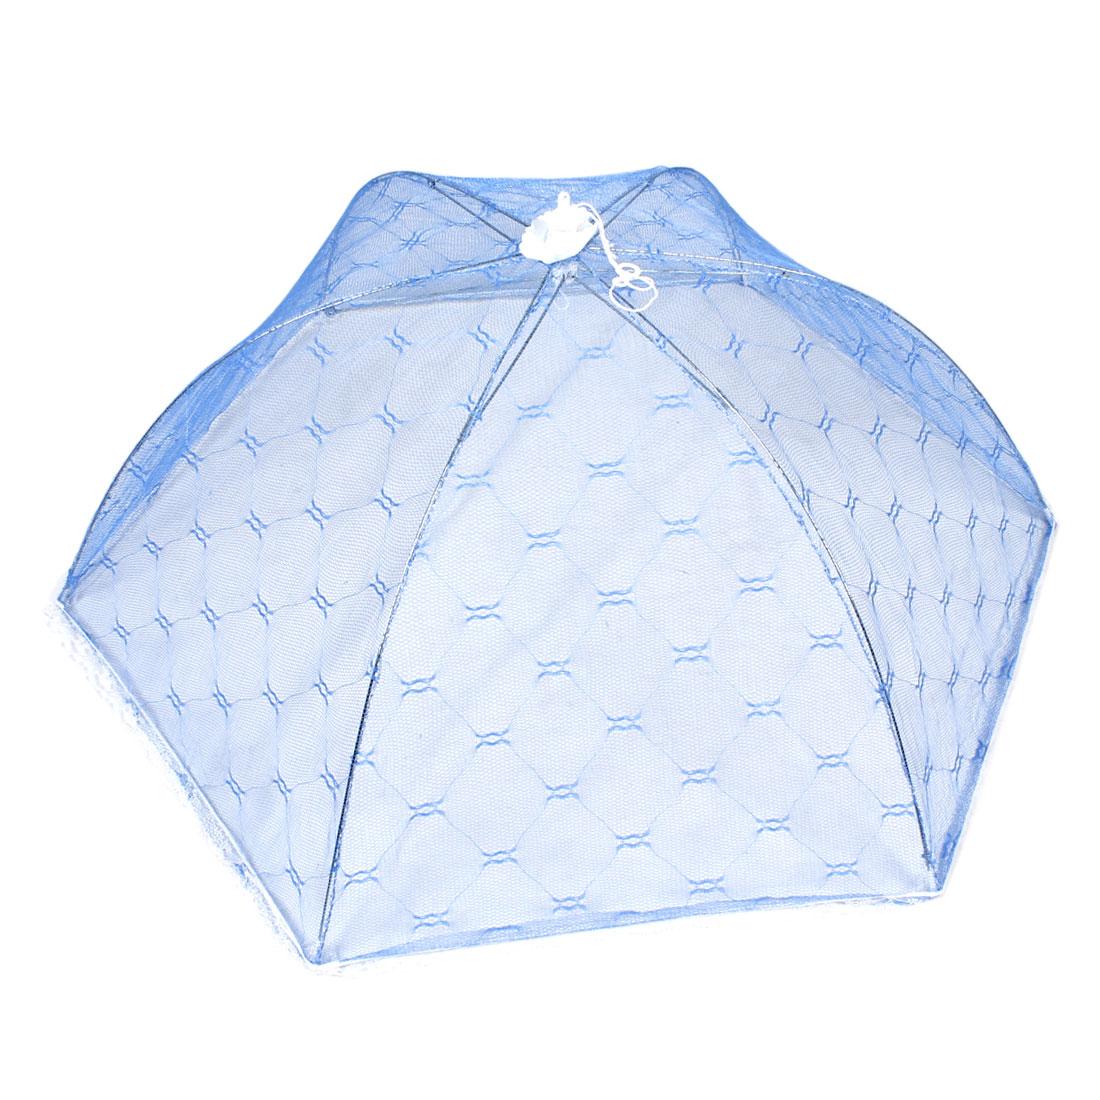 Household White Lace Trim Blue Nylon Mesh Foldable Dish Food Cover Umbrella